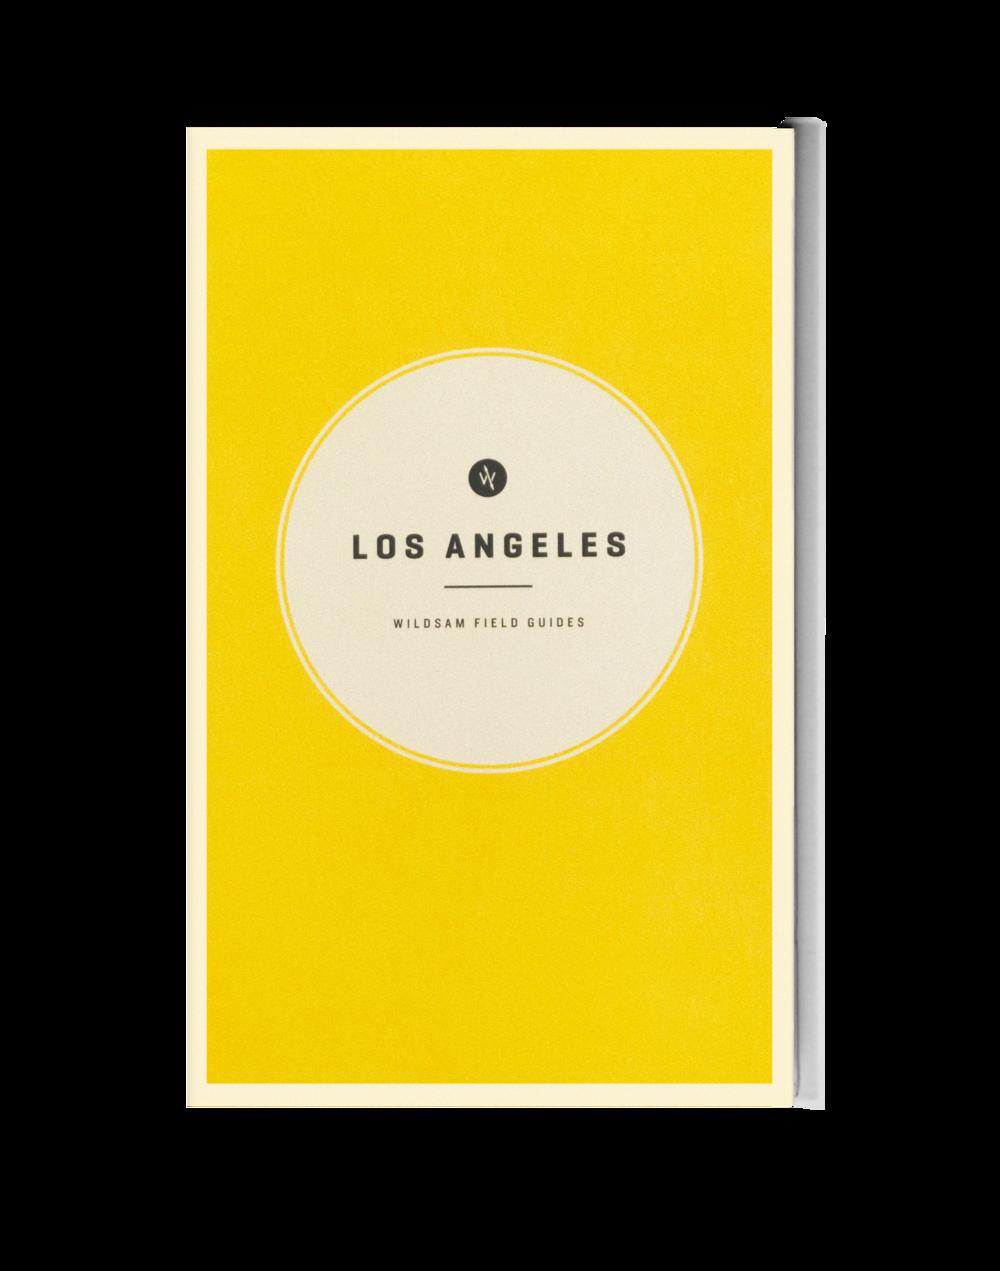 Wildsam-Los_Angeles_Guide-Flat.png